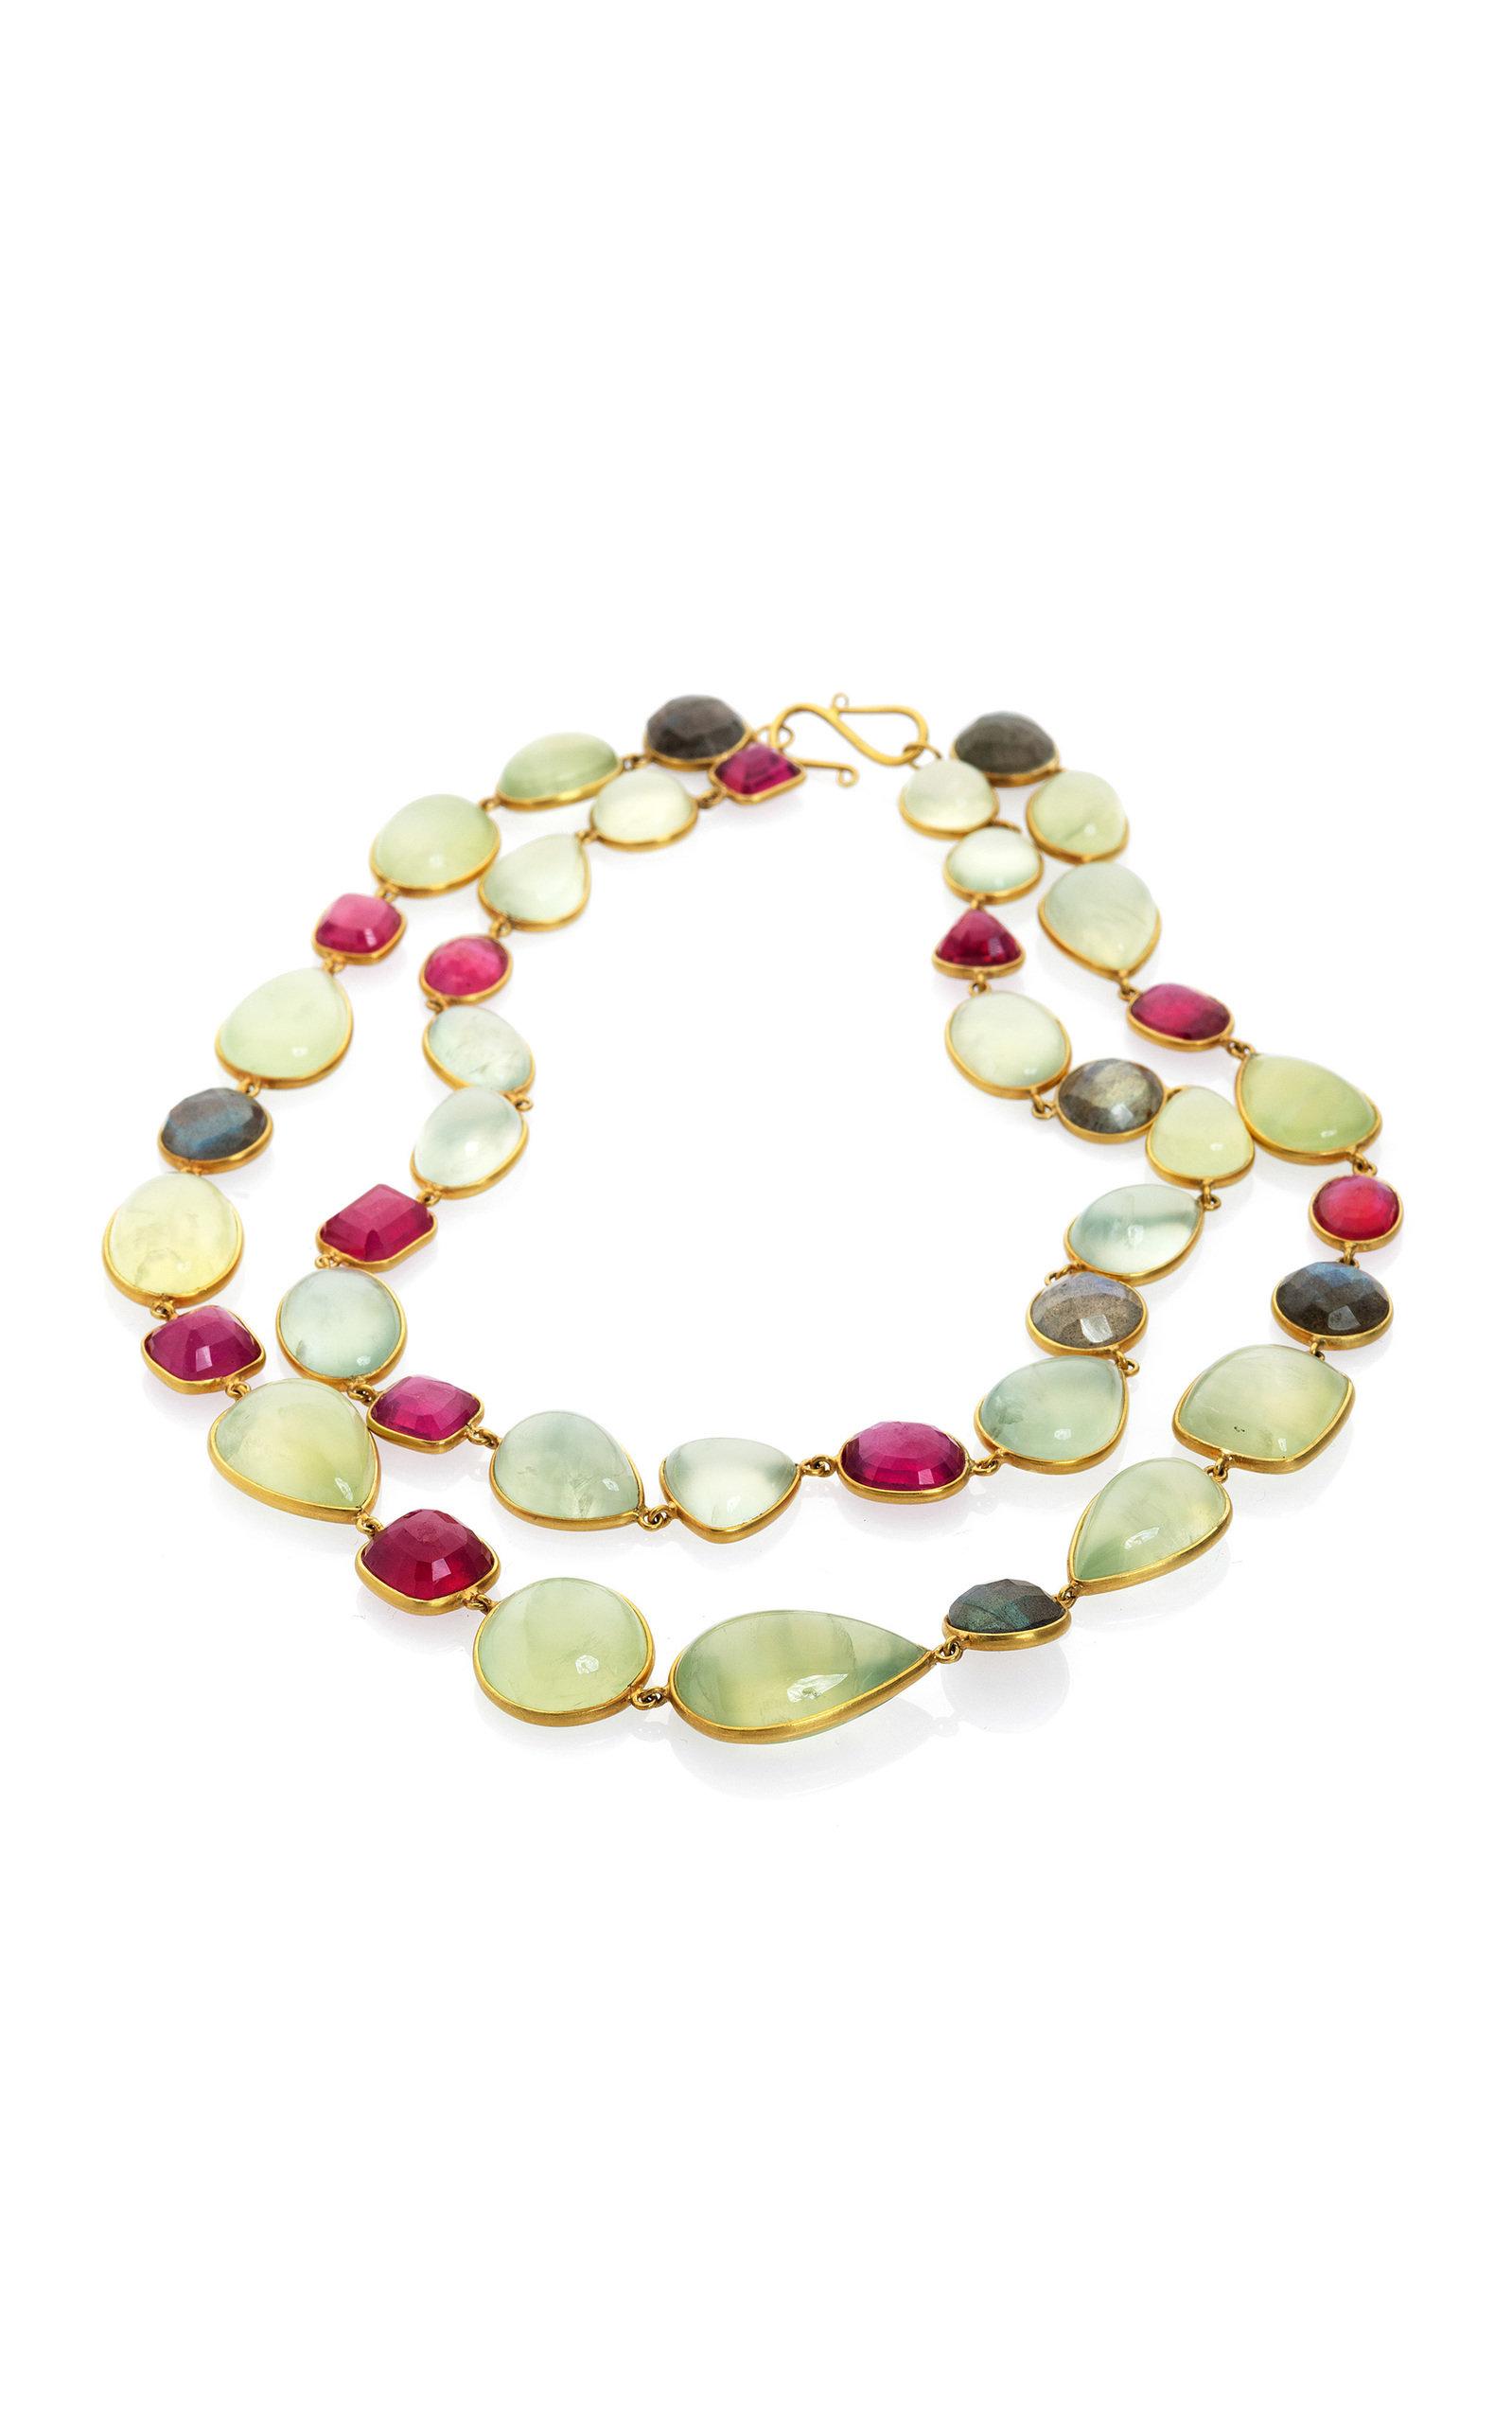 Women's Ruby; Labradorite; Praynite 18K Yellow Gold Necklace